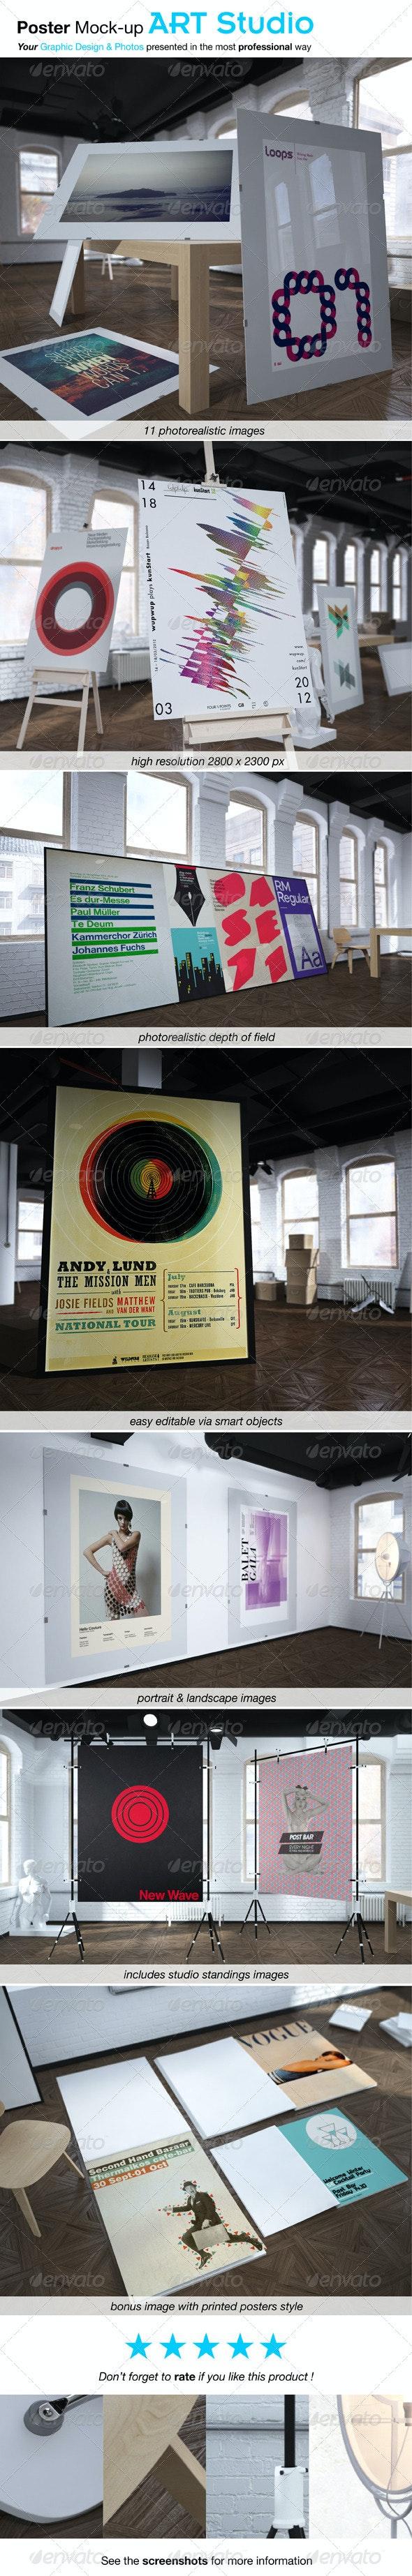 Poster Mock-up ART STUDIO - Posters Print